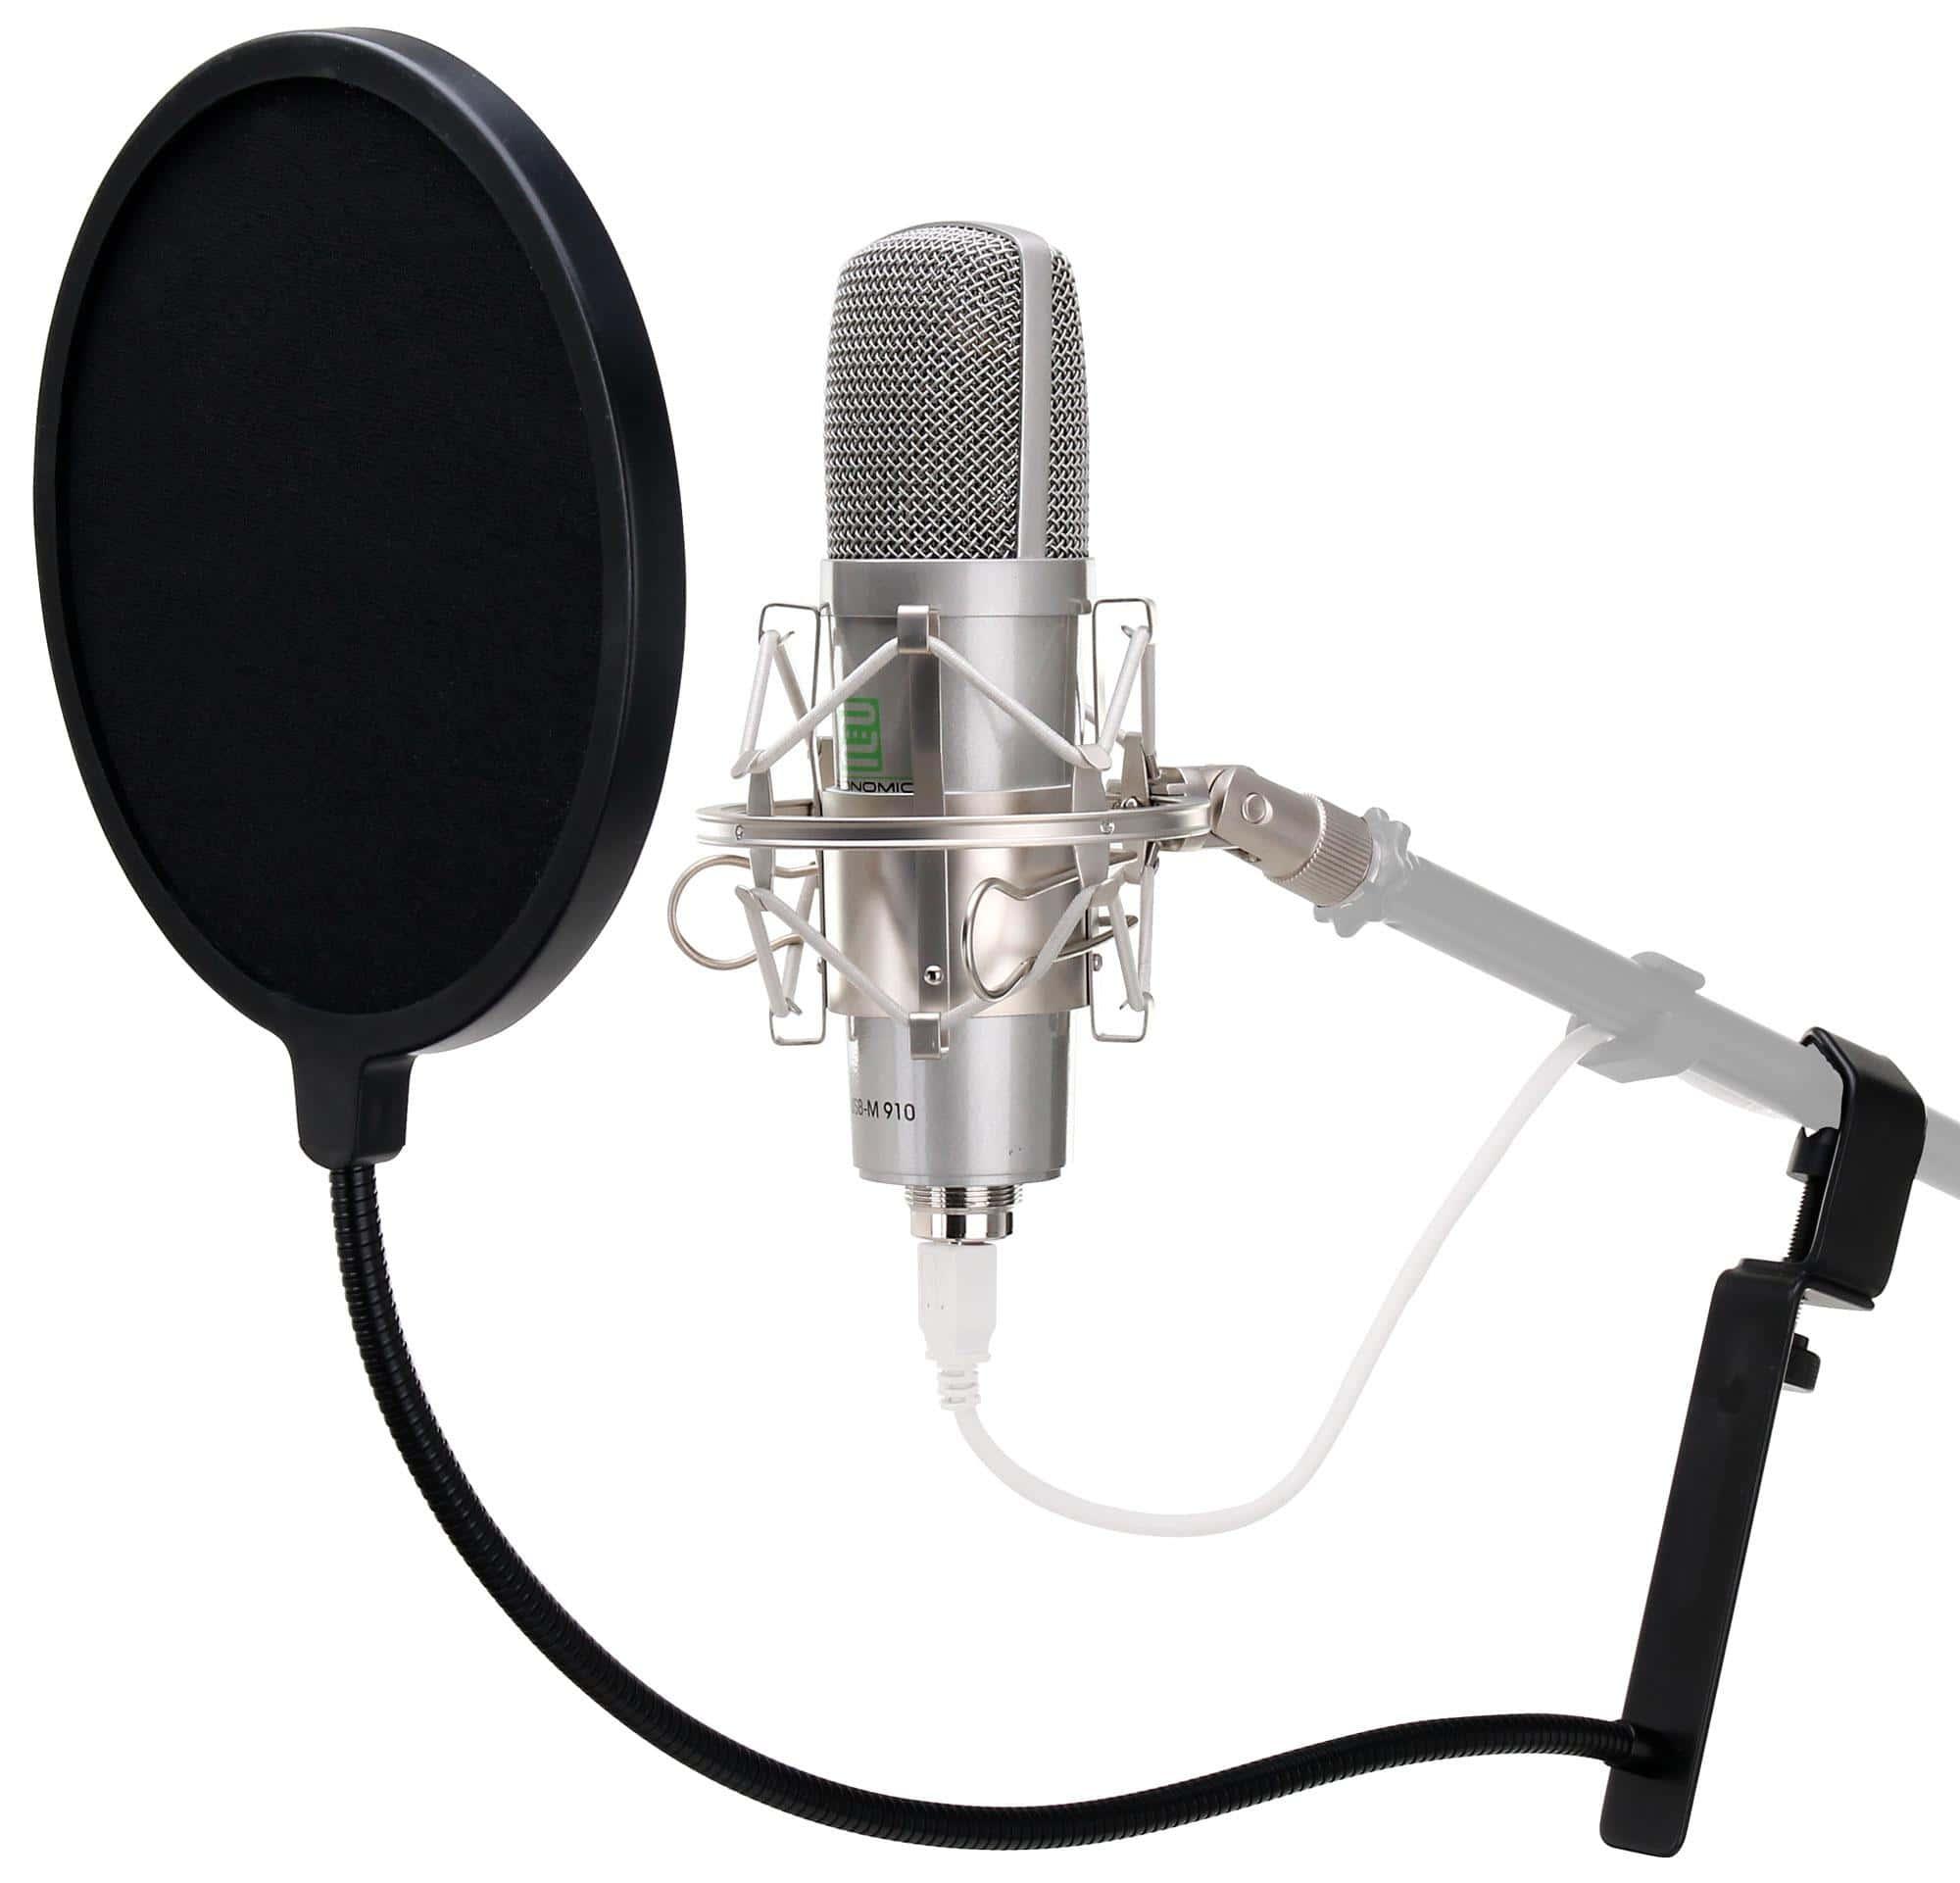 Mikrofone - Pronomic USB M 910 Podcast Kondensatormikrofon Popschutz - Onlineshop Musikhaus Kirstein